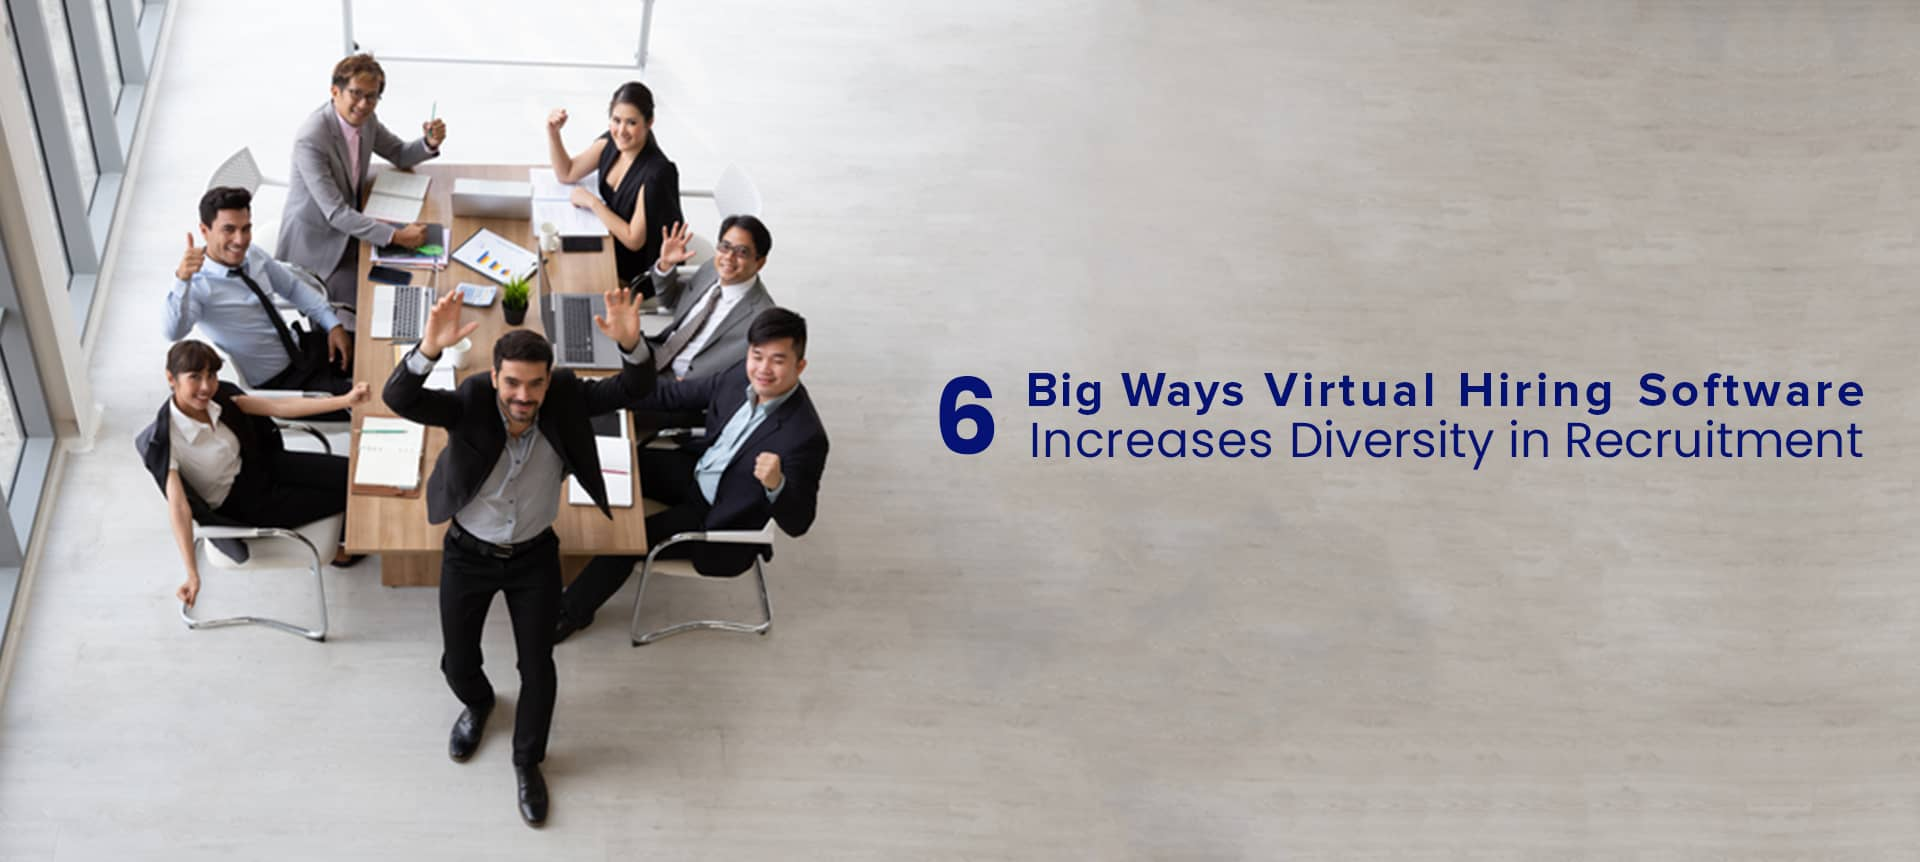 recruiters using virtual hiring software